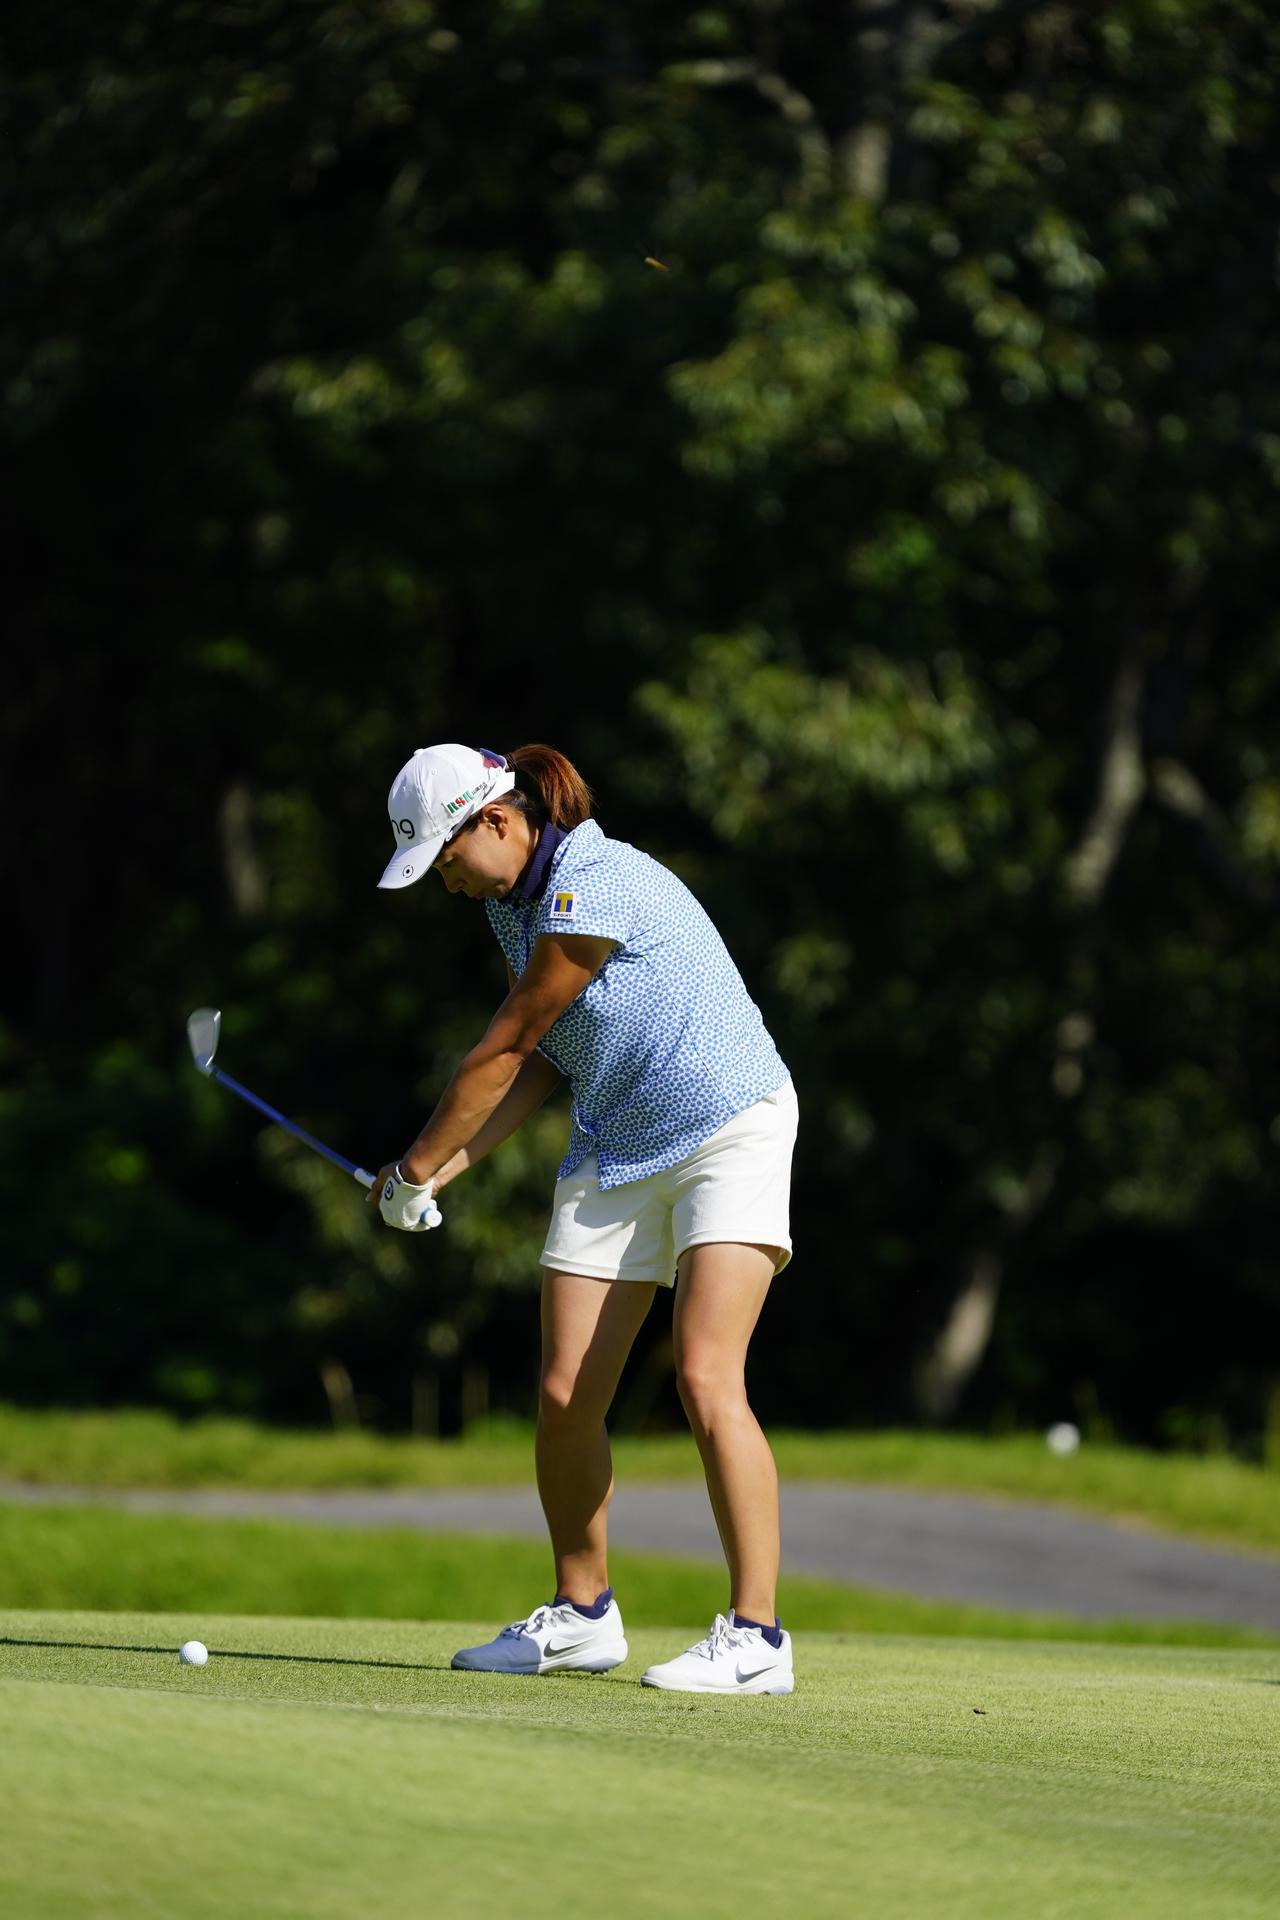 Images : 13番目の画像 - 渋野日向子 アイアン連続写真 - みんなのゴルフダイジェスト